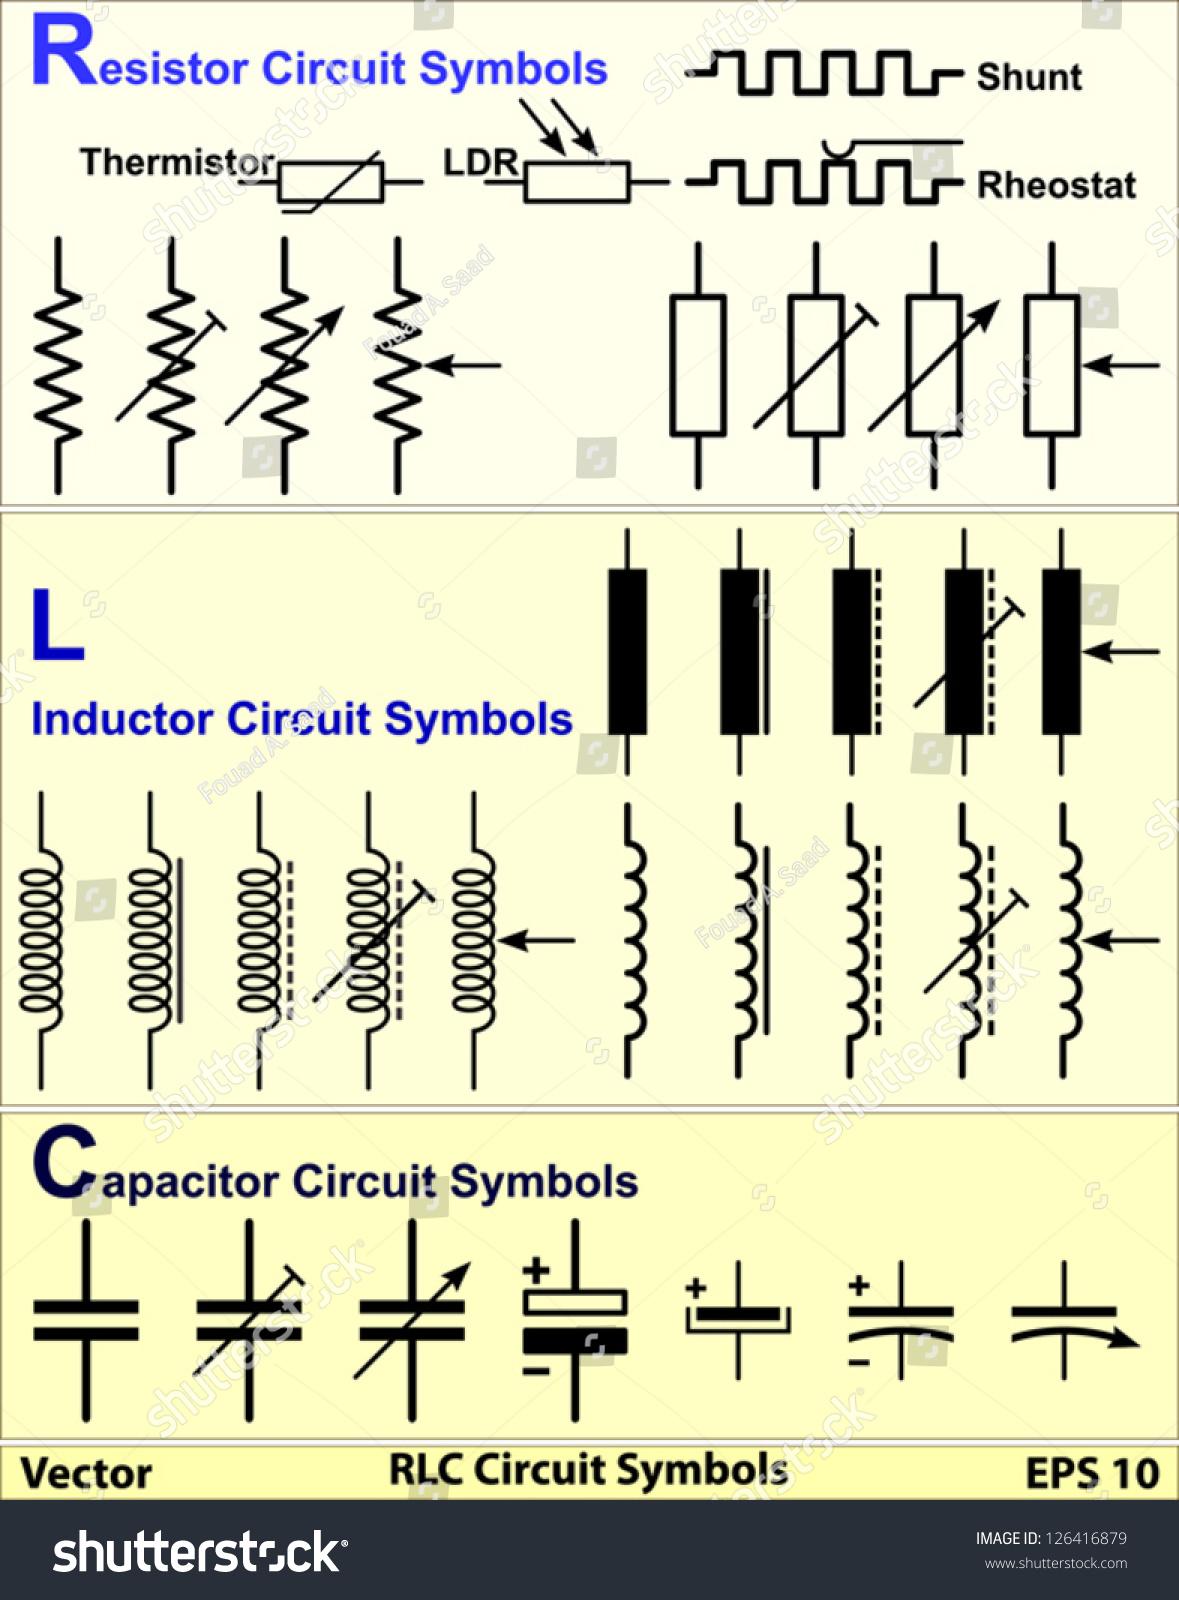 RLC Circuit Symbols Stock Vector 126416879 - Shutterstock